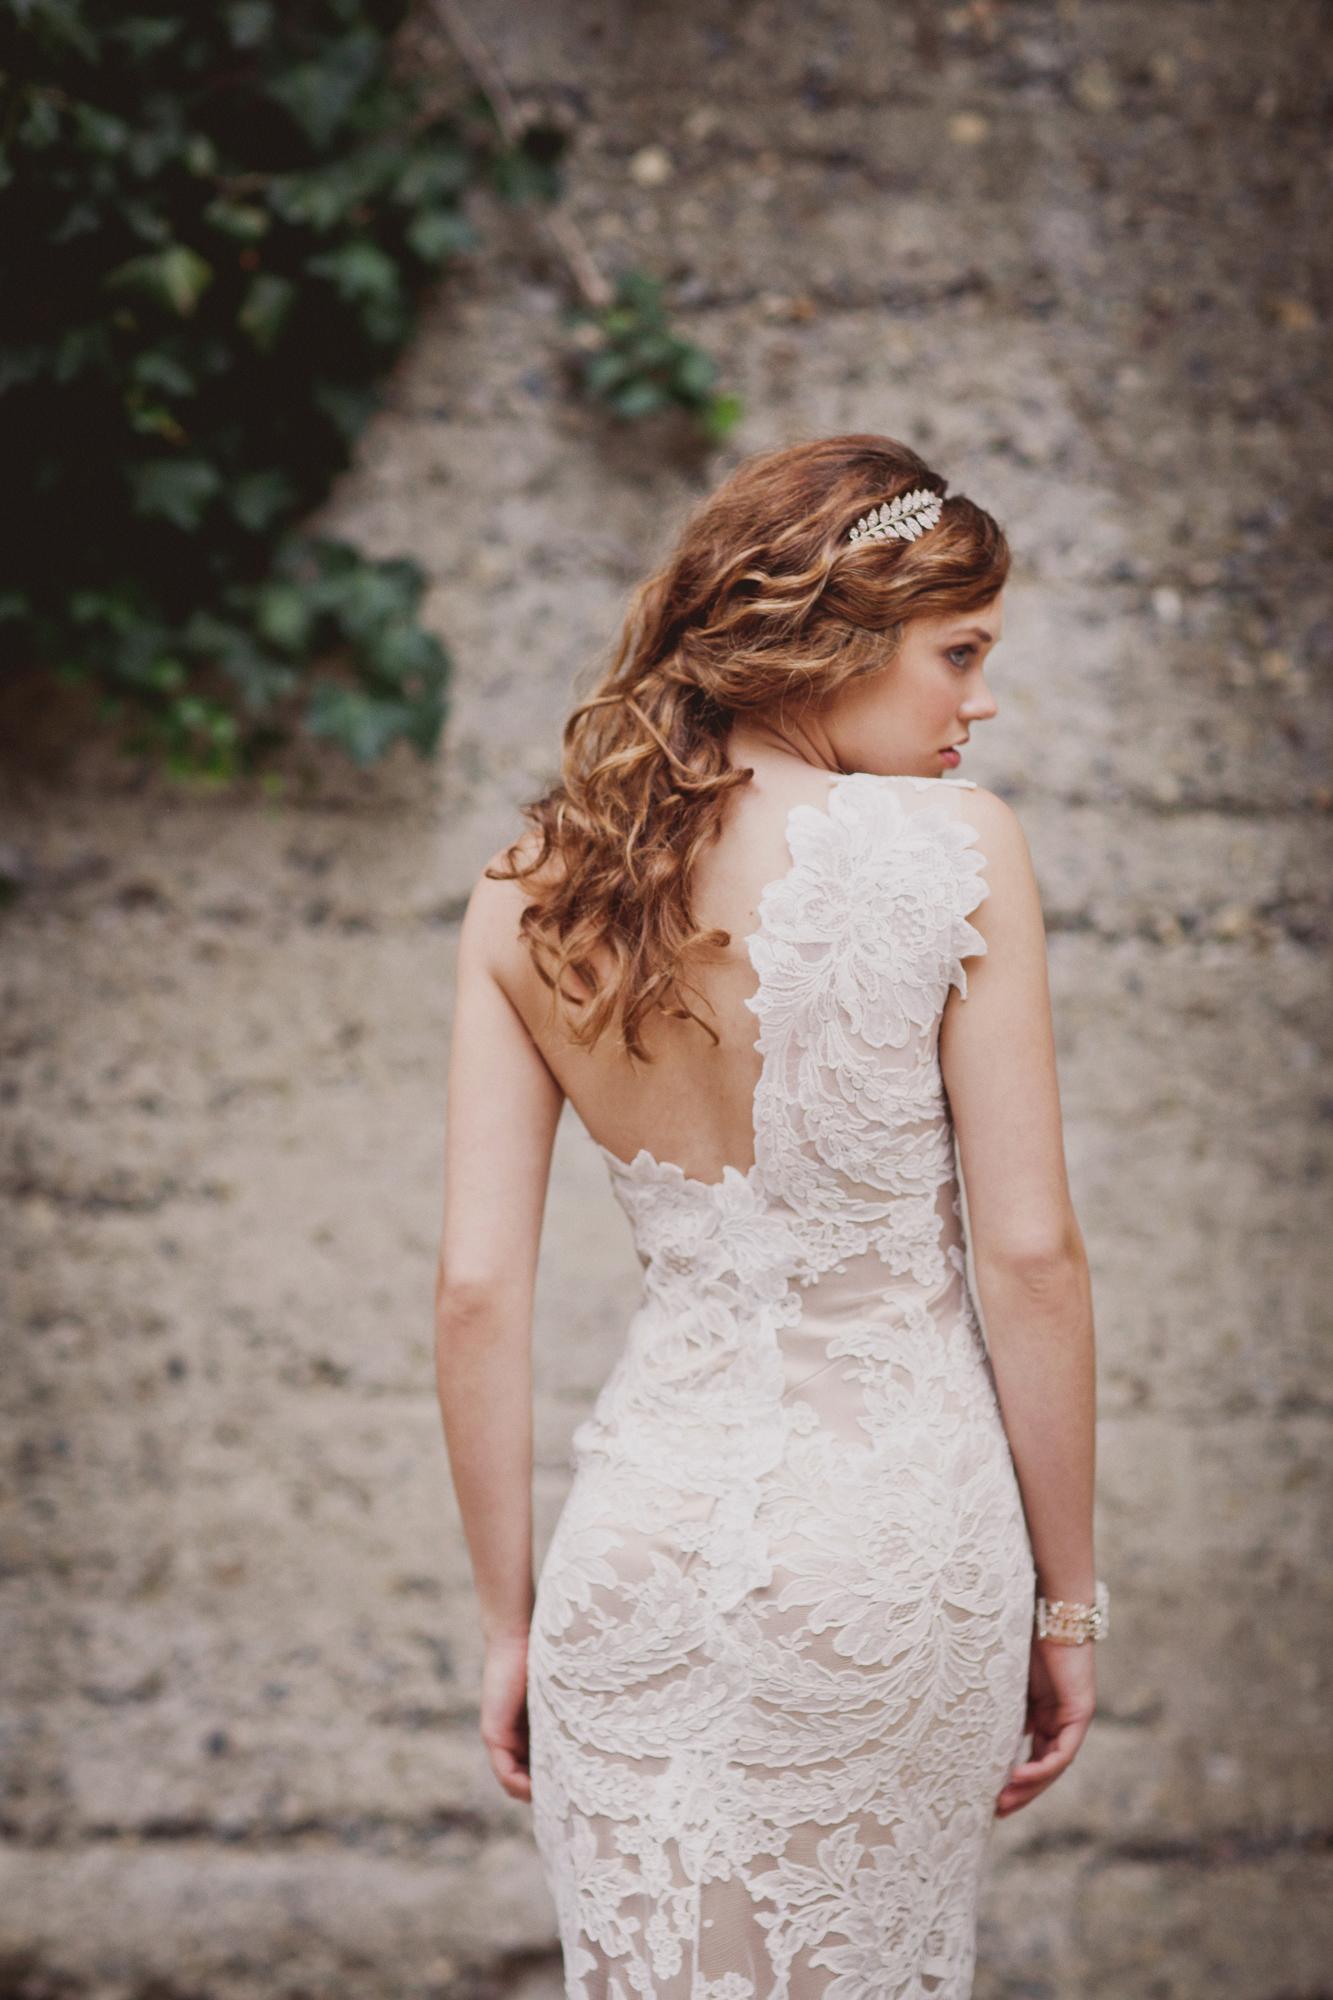 jennifer-skog-bridal-fashion-photographer-lifestyle-0009.jpg